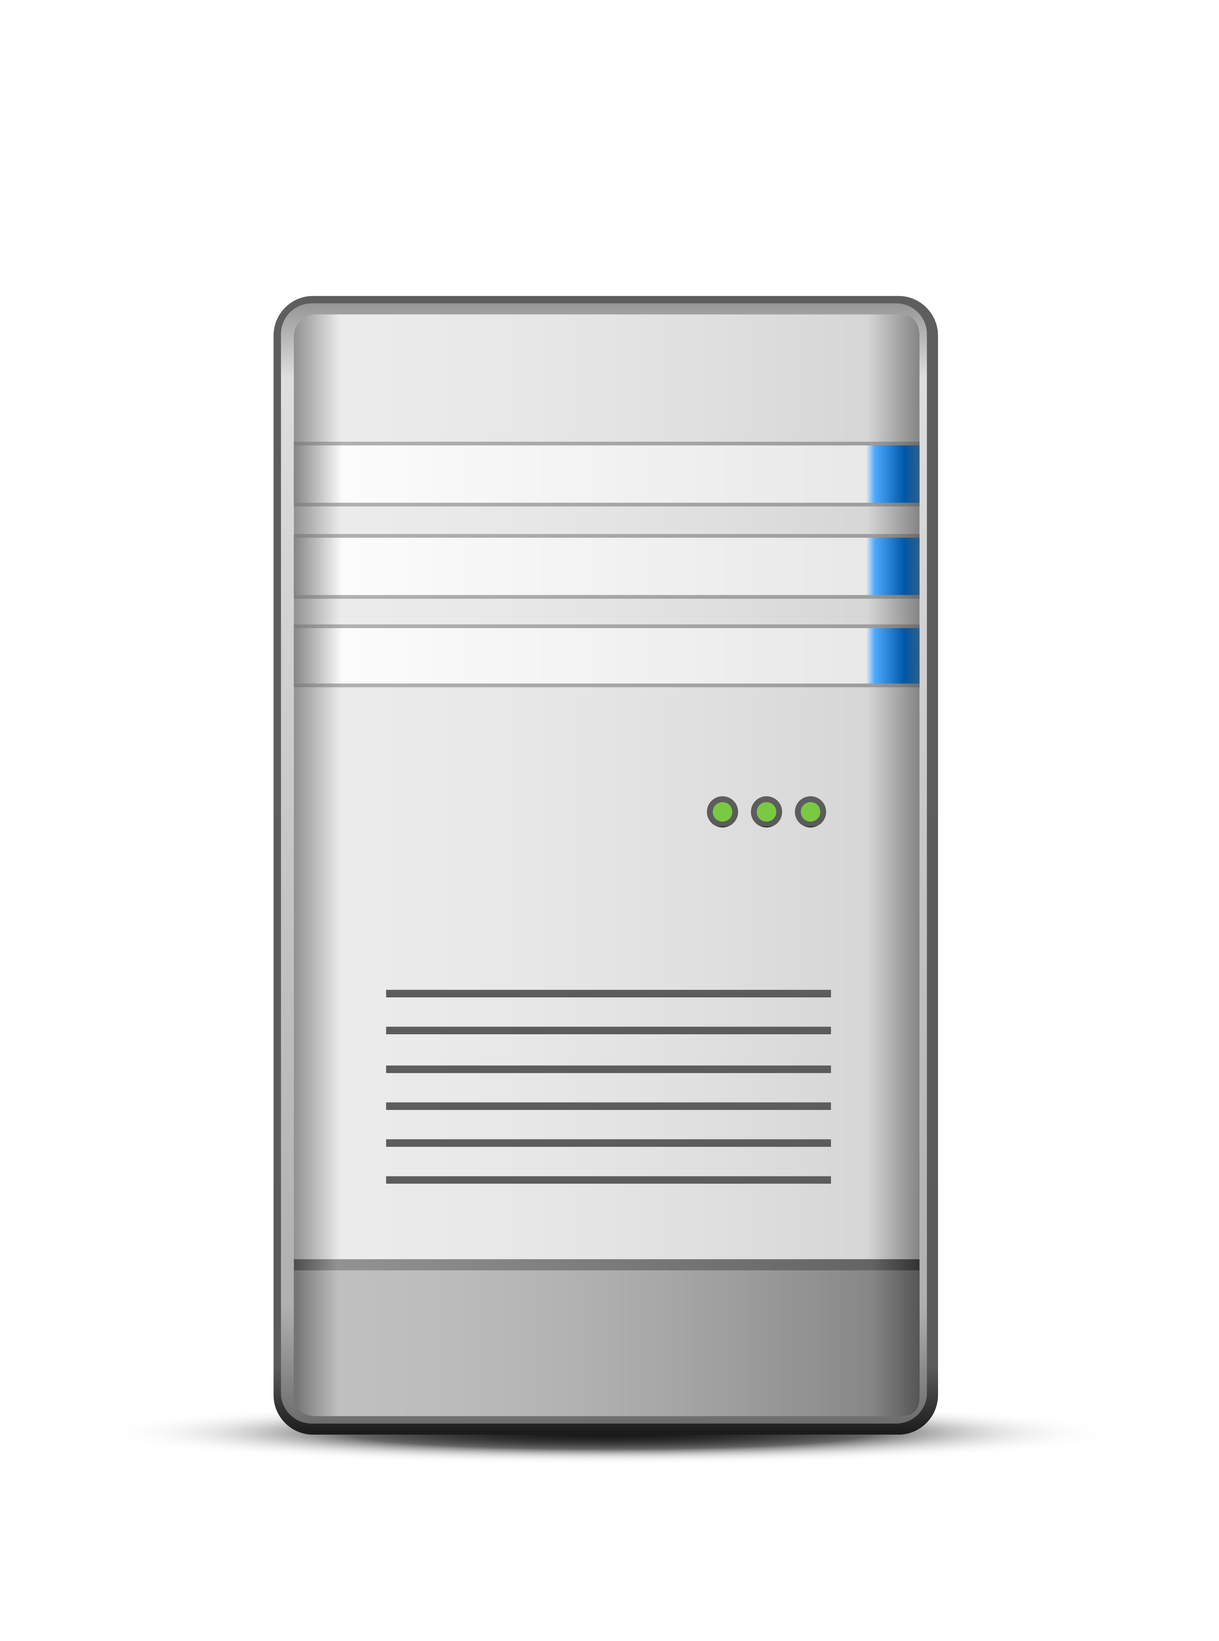 Server based EHR